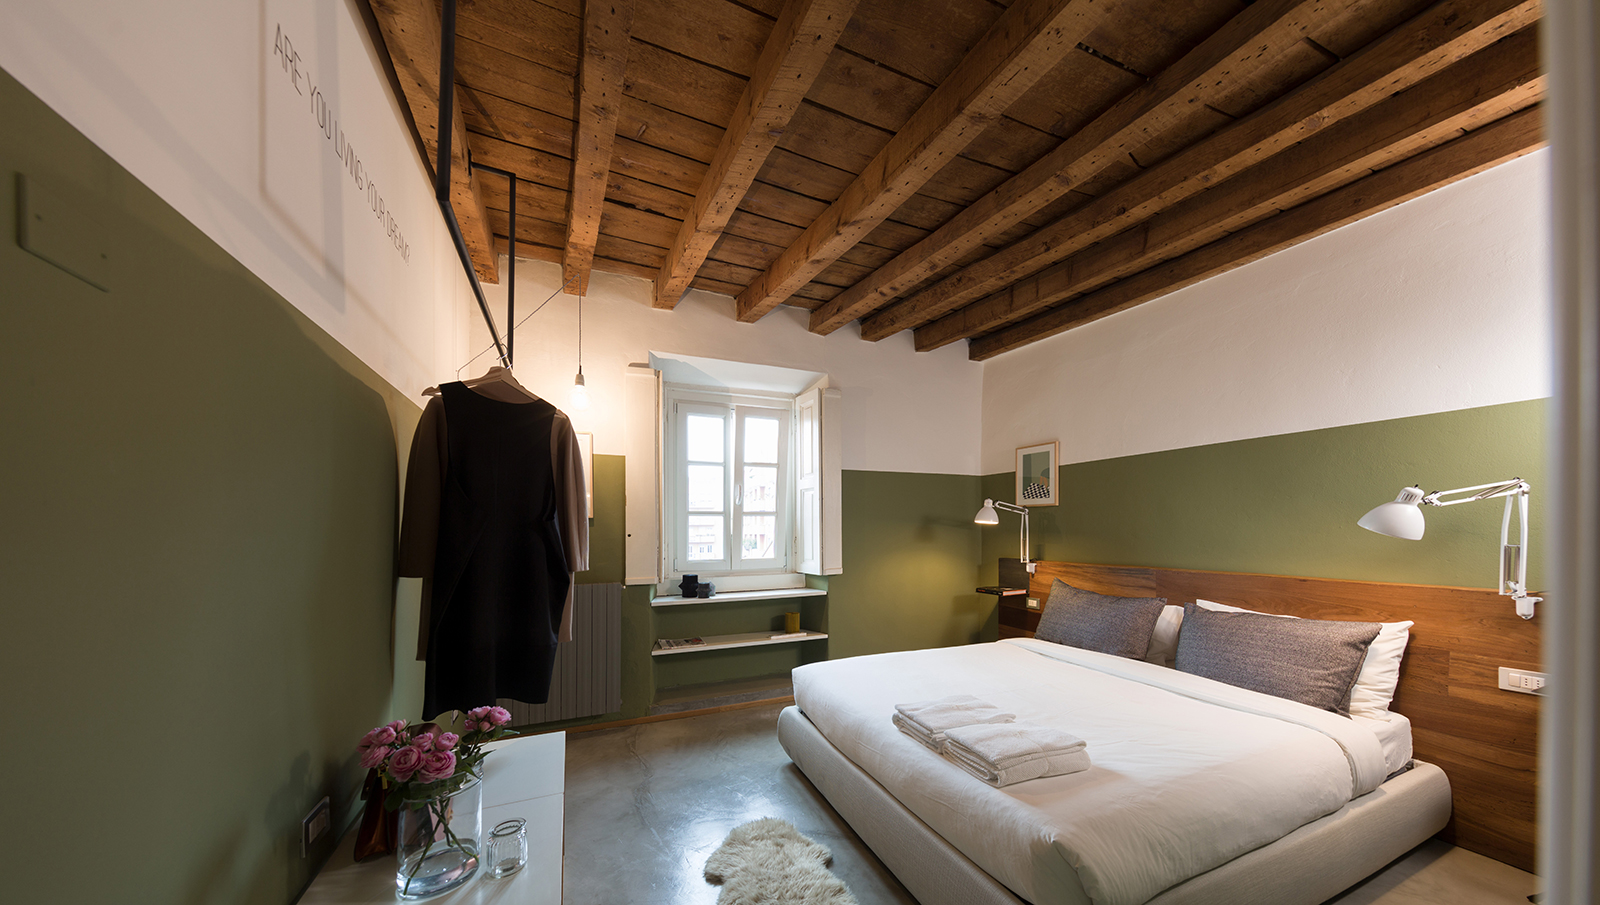 Lovely Milan Aparment For Rent: Artistu0027s Loft By Onstanza Cecchini